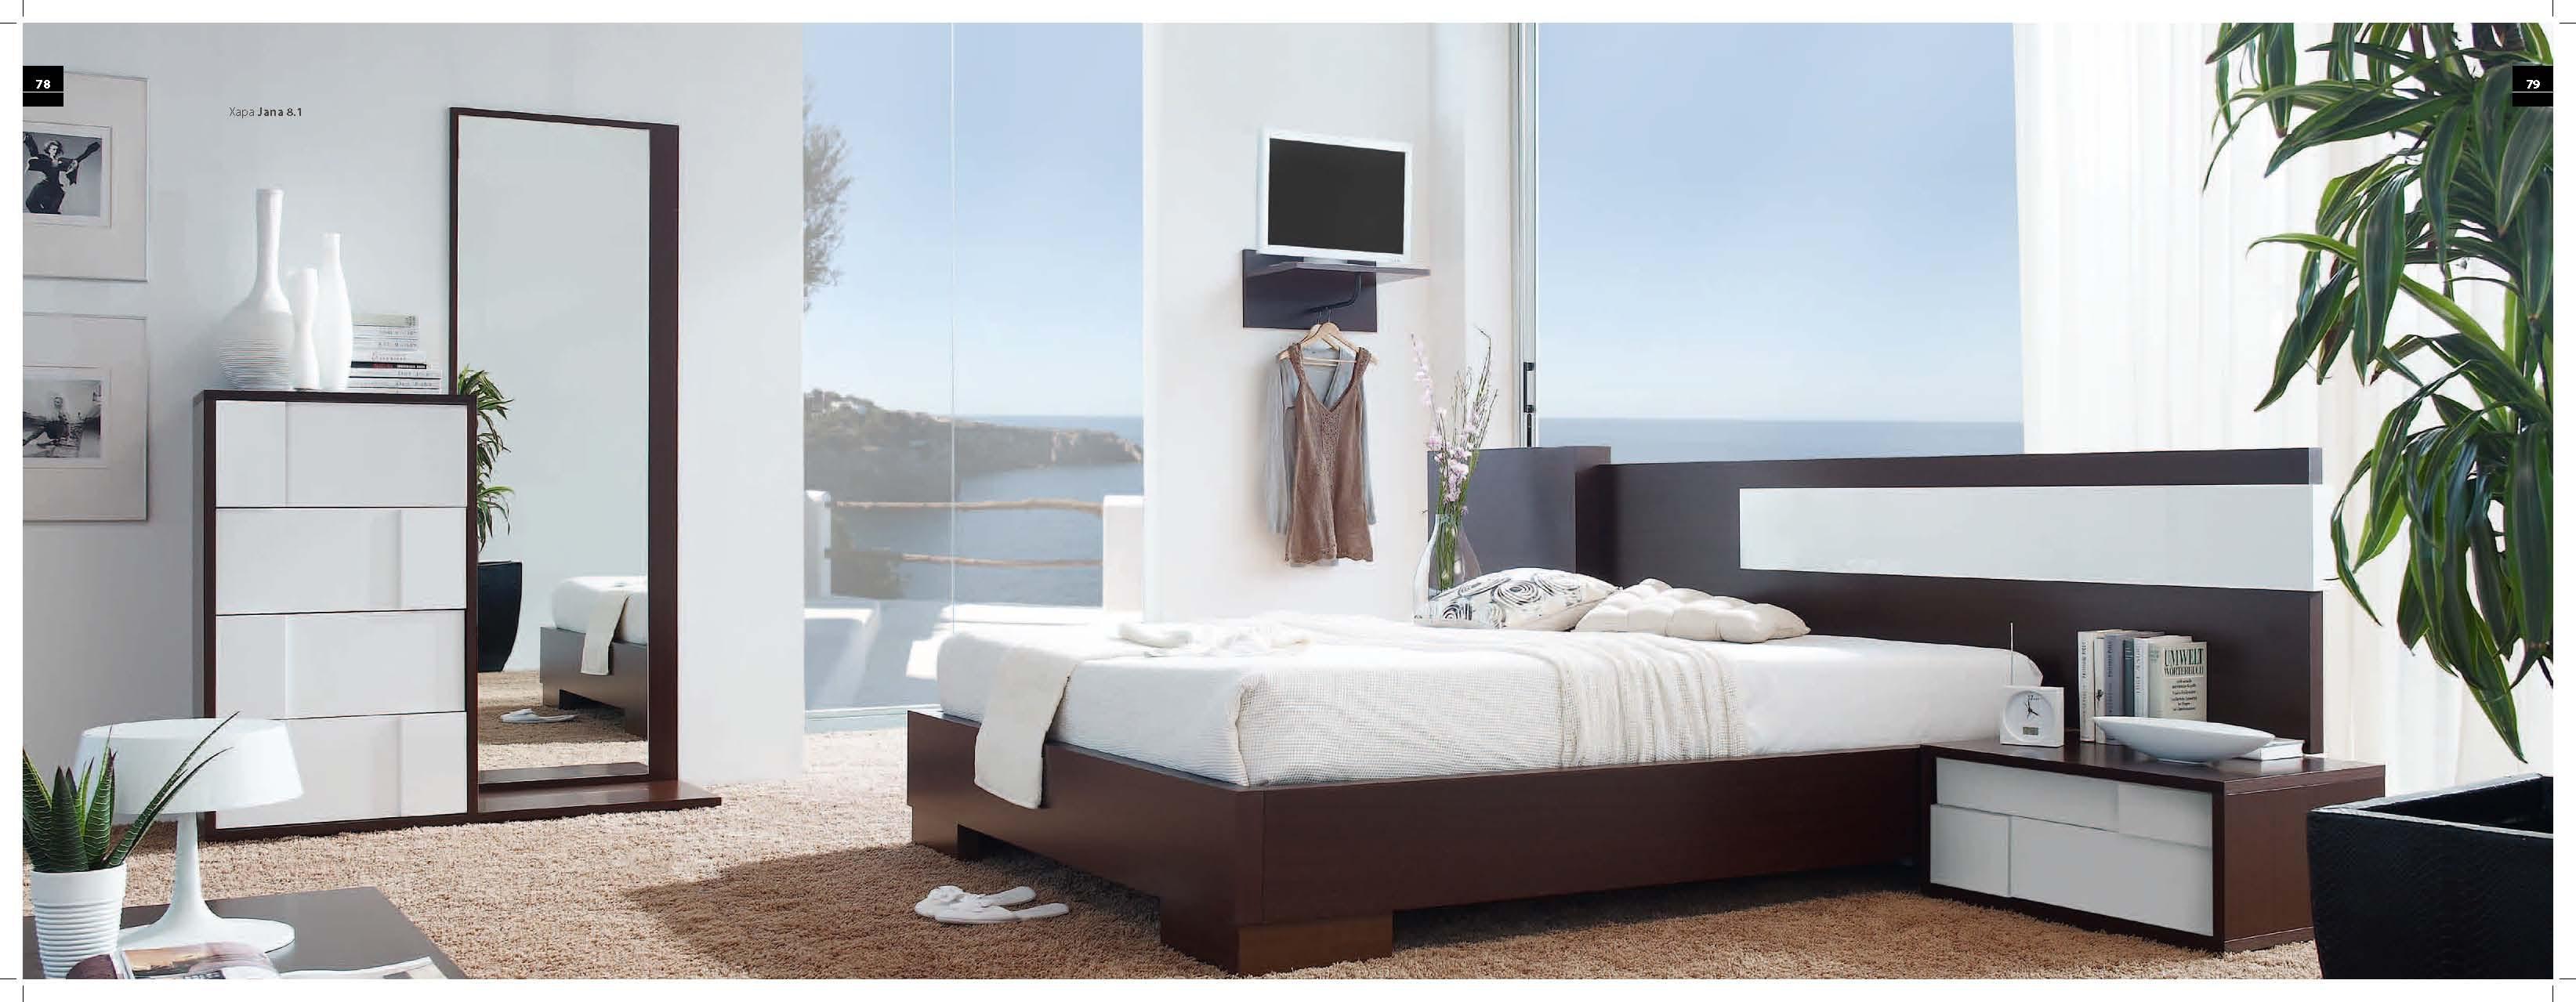 Bedroom : Attractive Headboard Also Blanket Mattre Master Bedroom Pertaining To Modern Bedroom Mirrors (View 4 of 20)